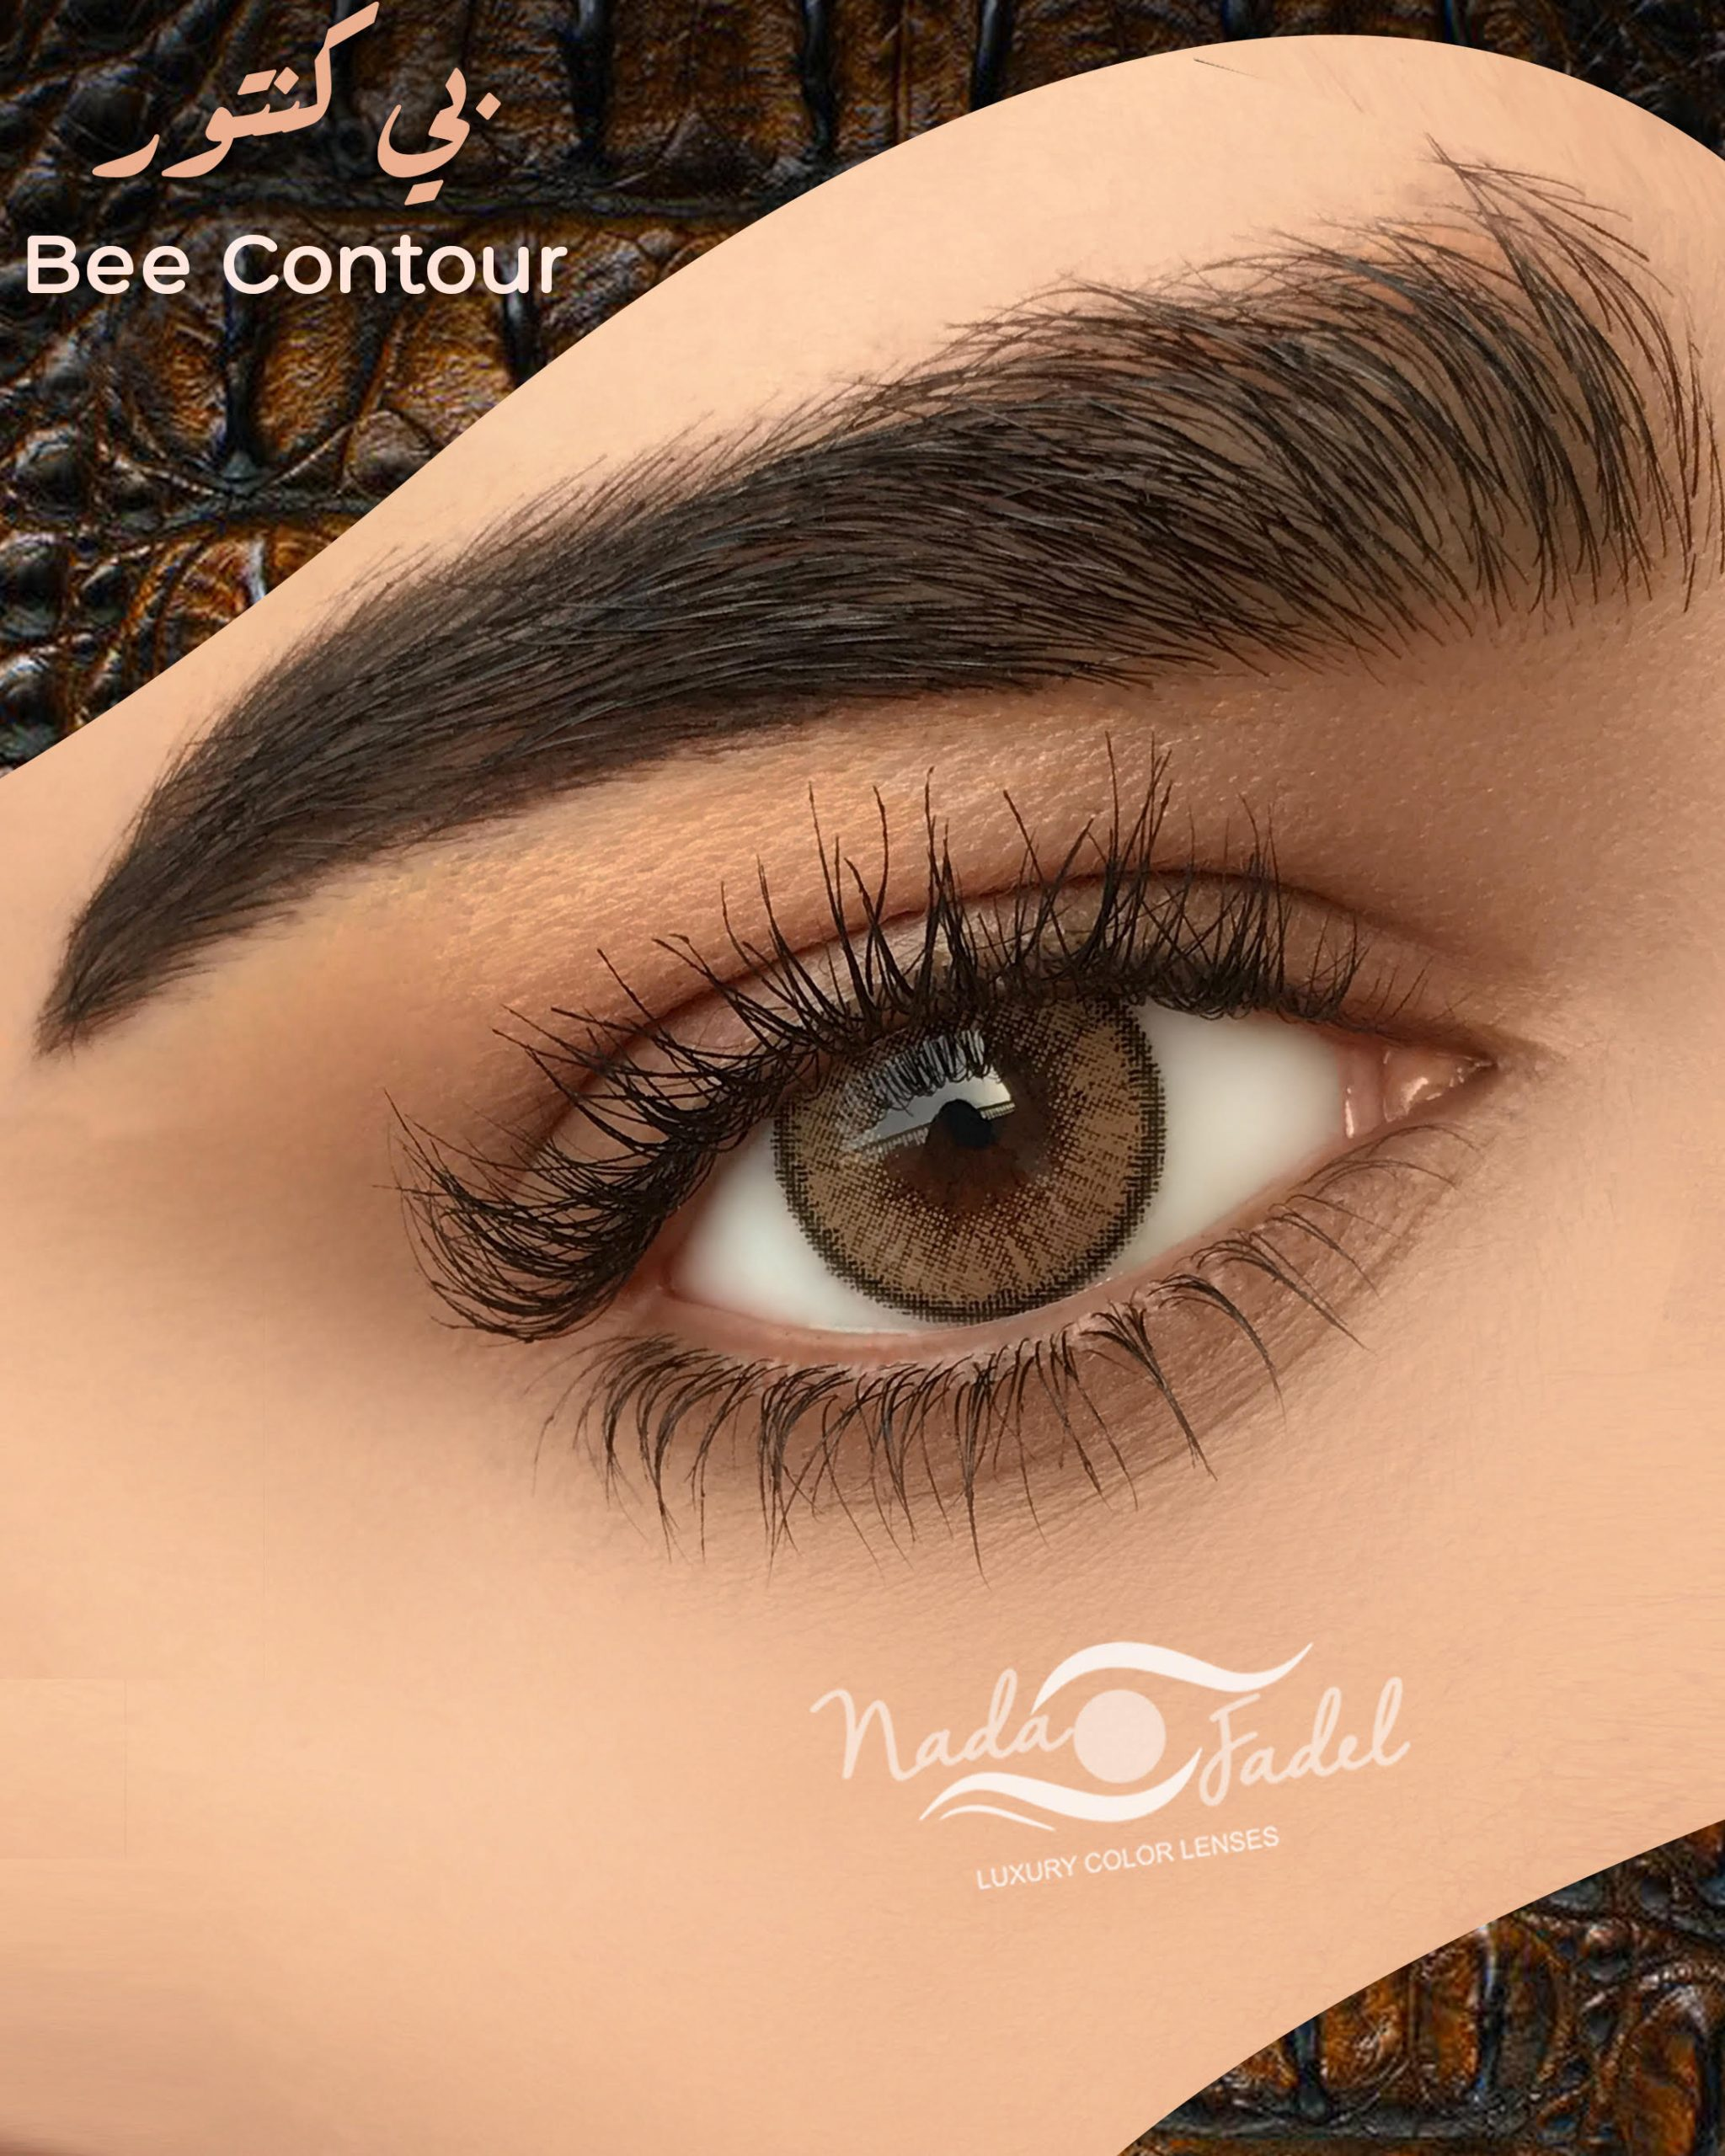 Bee contour